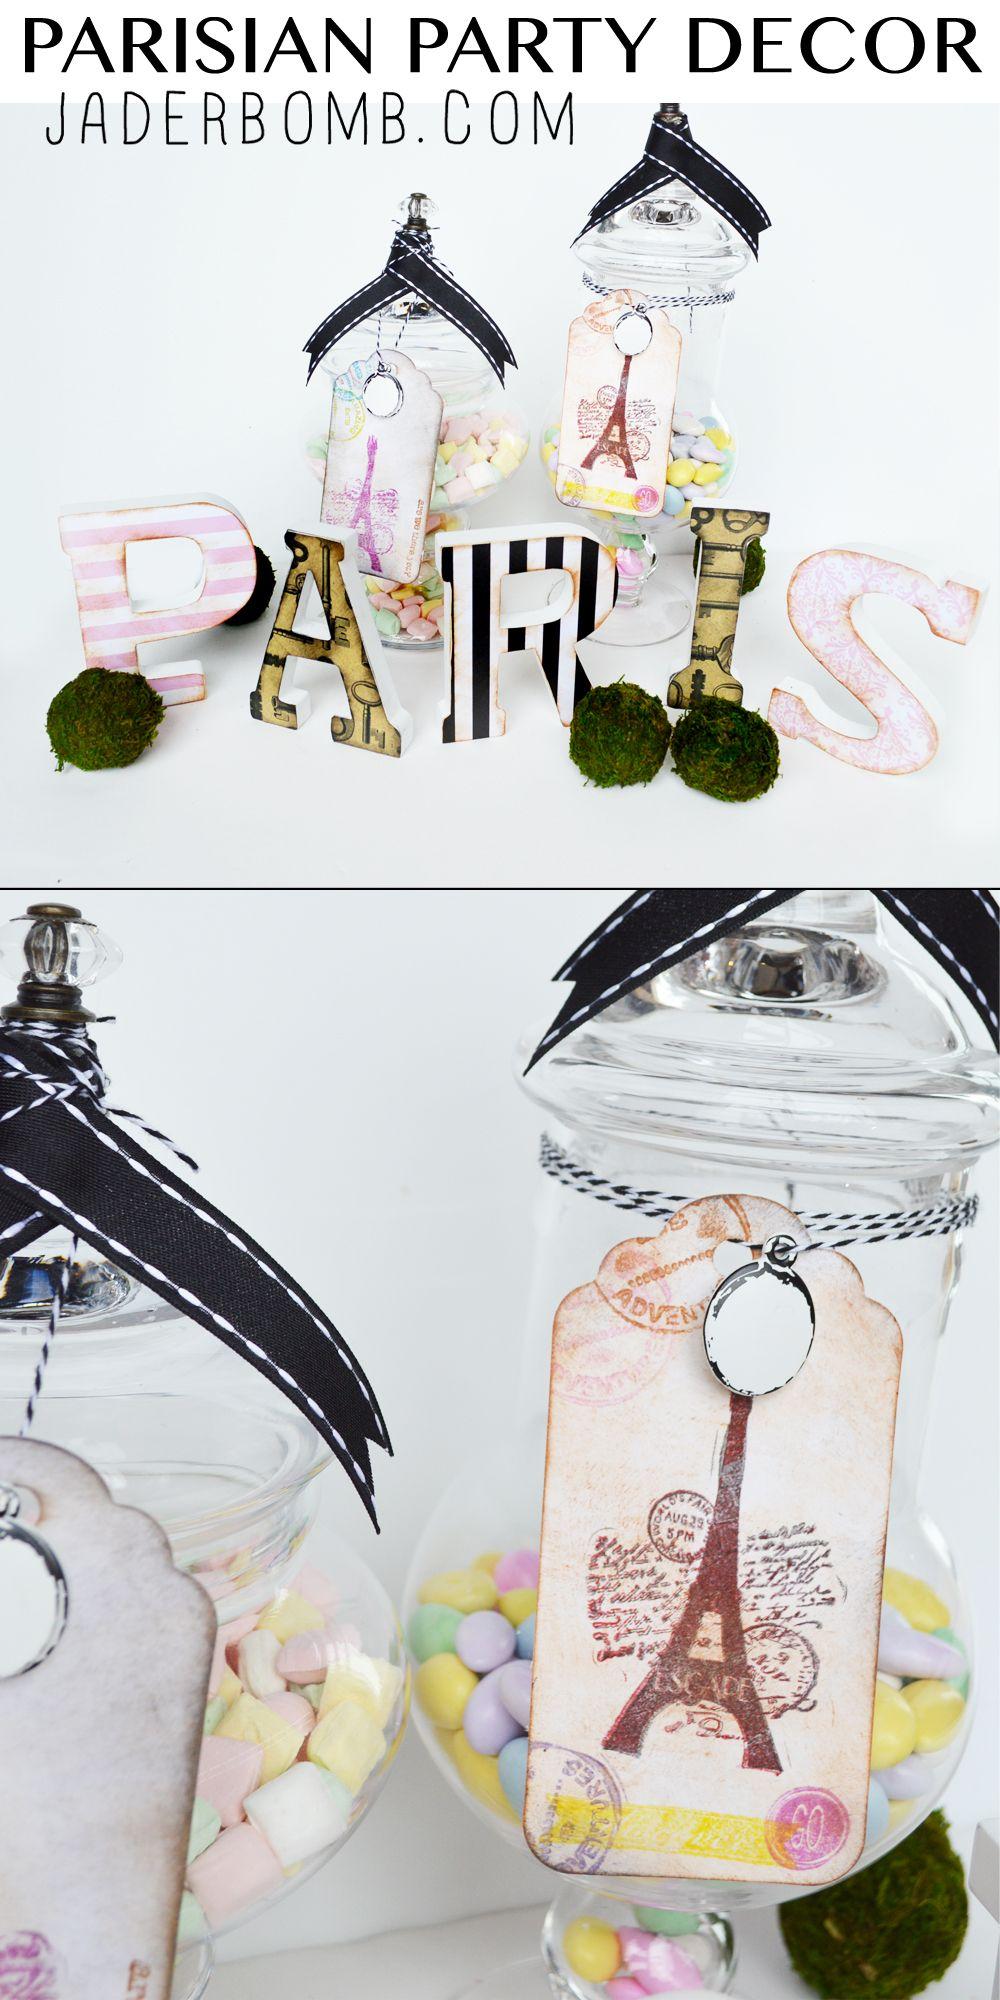 Parisian Party Decor | Parisian party, Parisians and DIY ideas